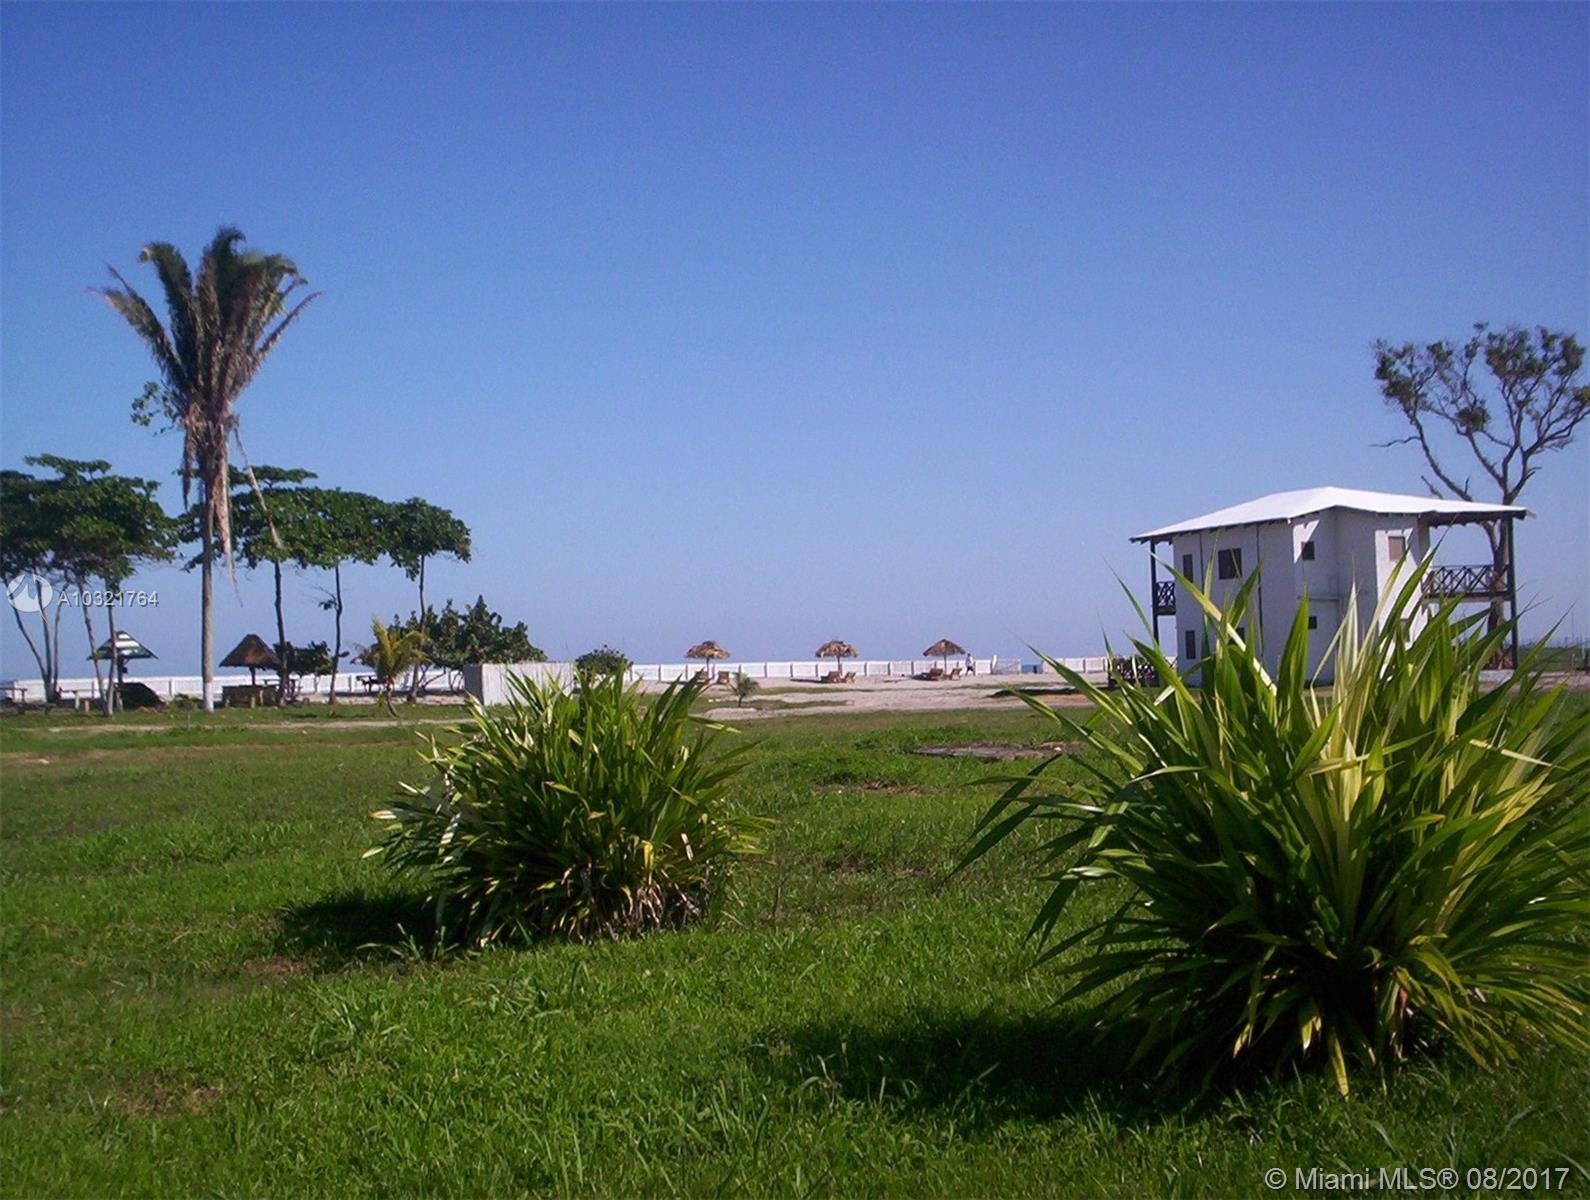 La Ceiba Honduras, Other County - Not In Usa, FL 31101